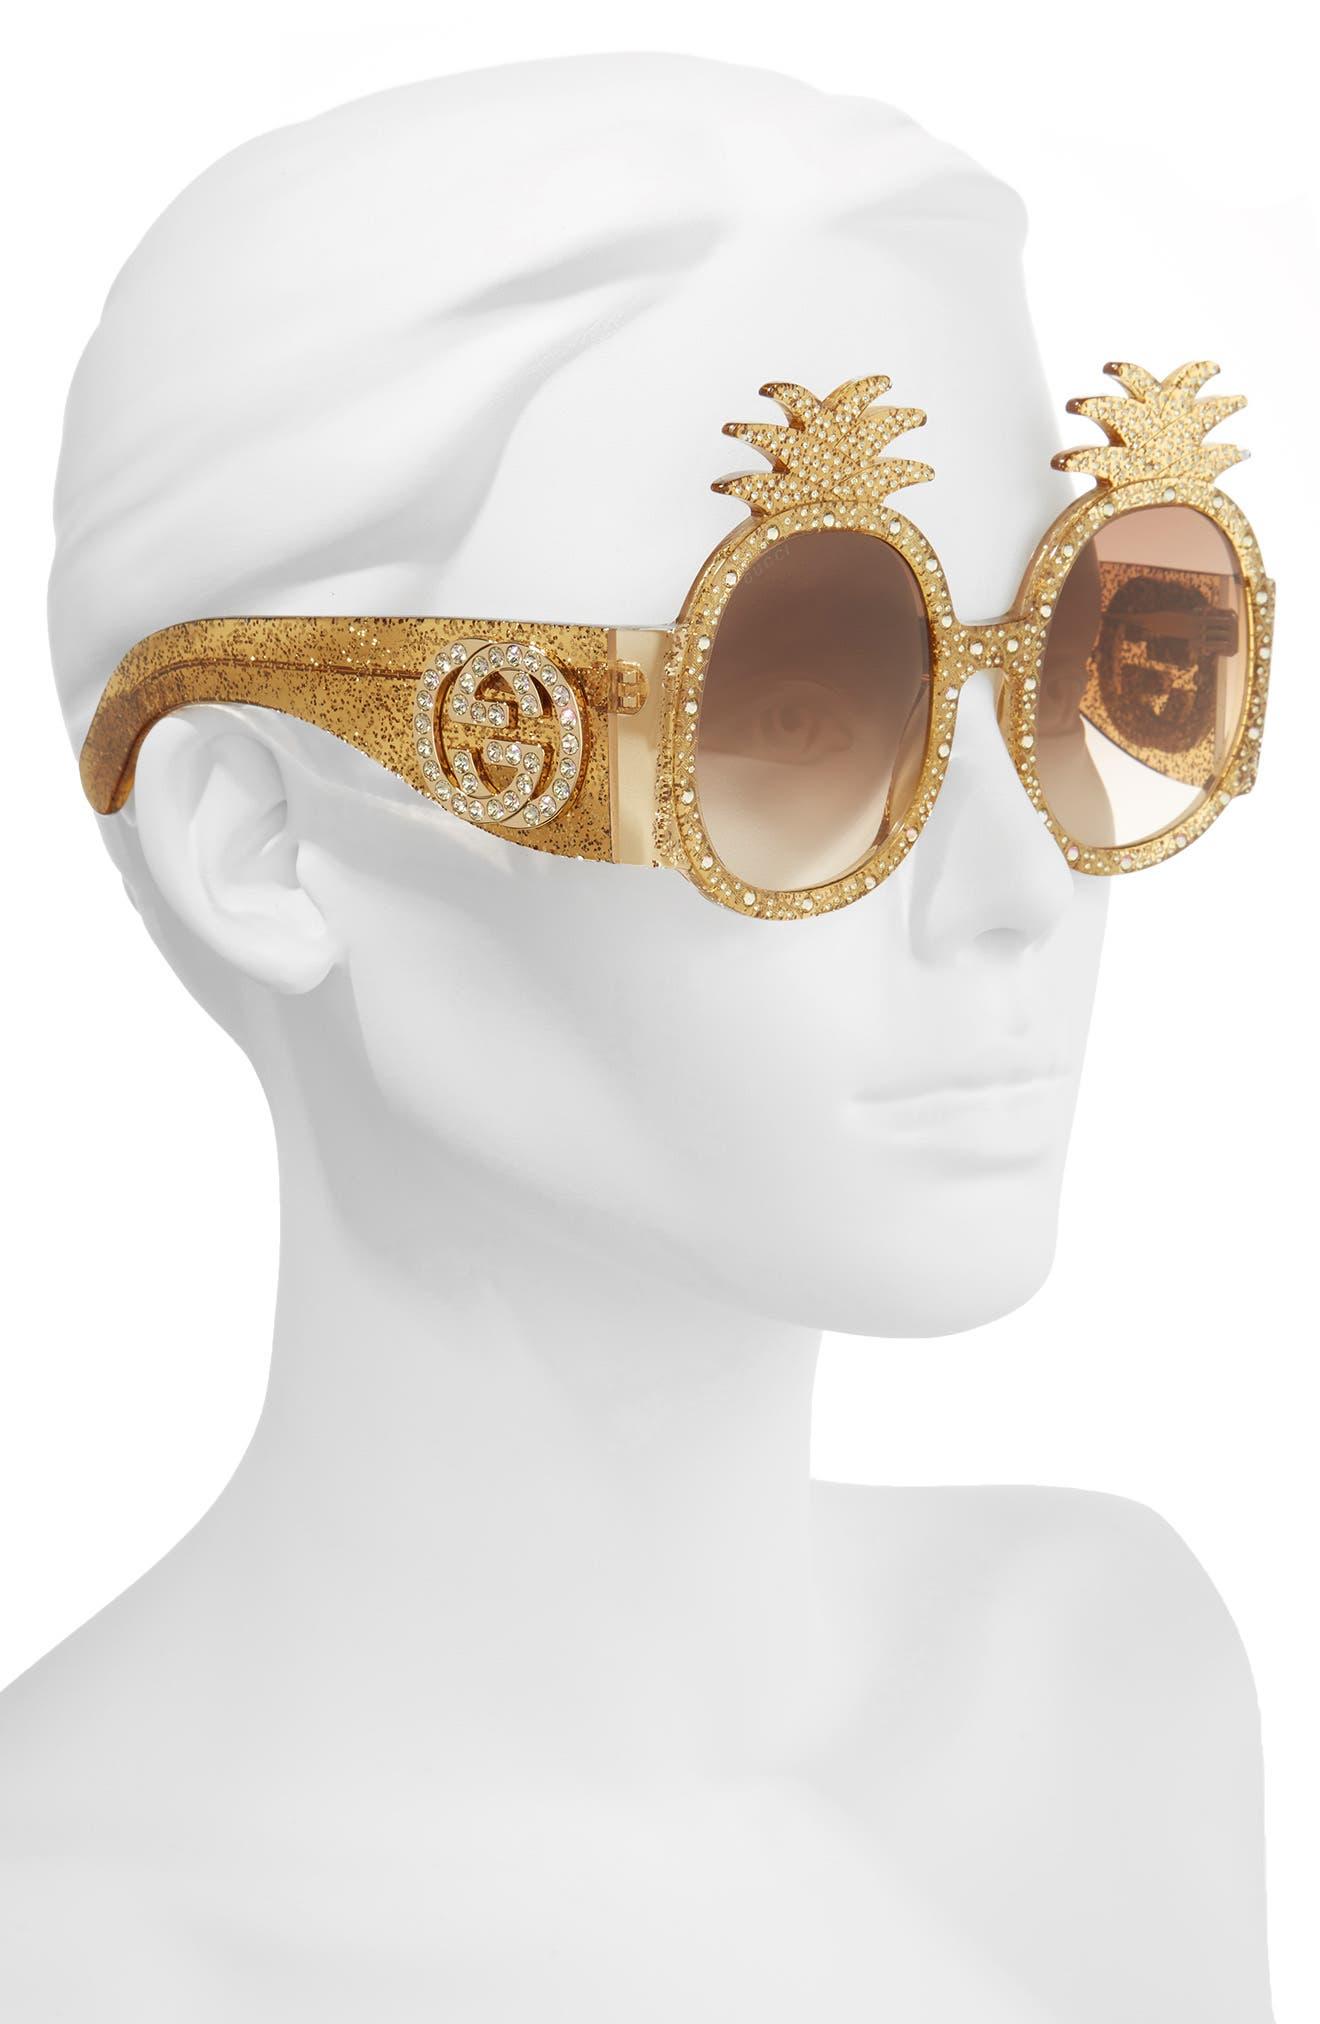 53mm Pineapple Sunglasses,                             Alternate thumbnail 3, color,                             GOLD